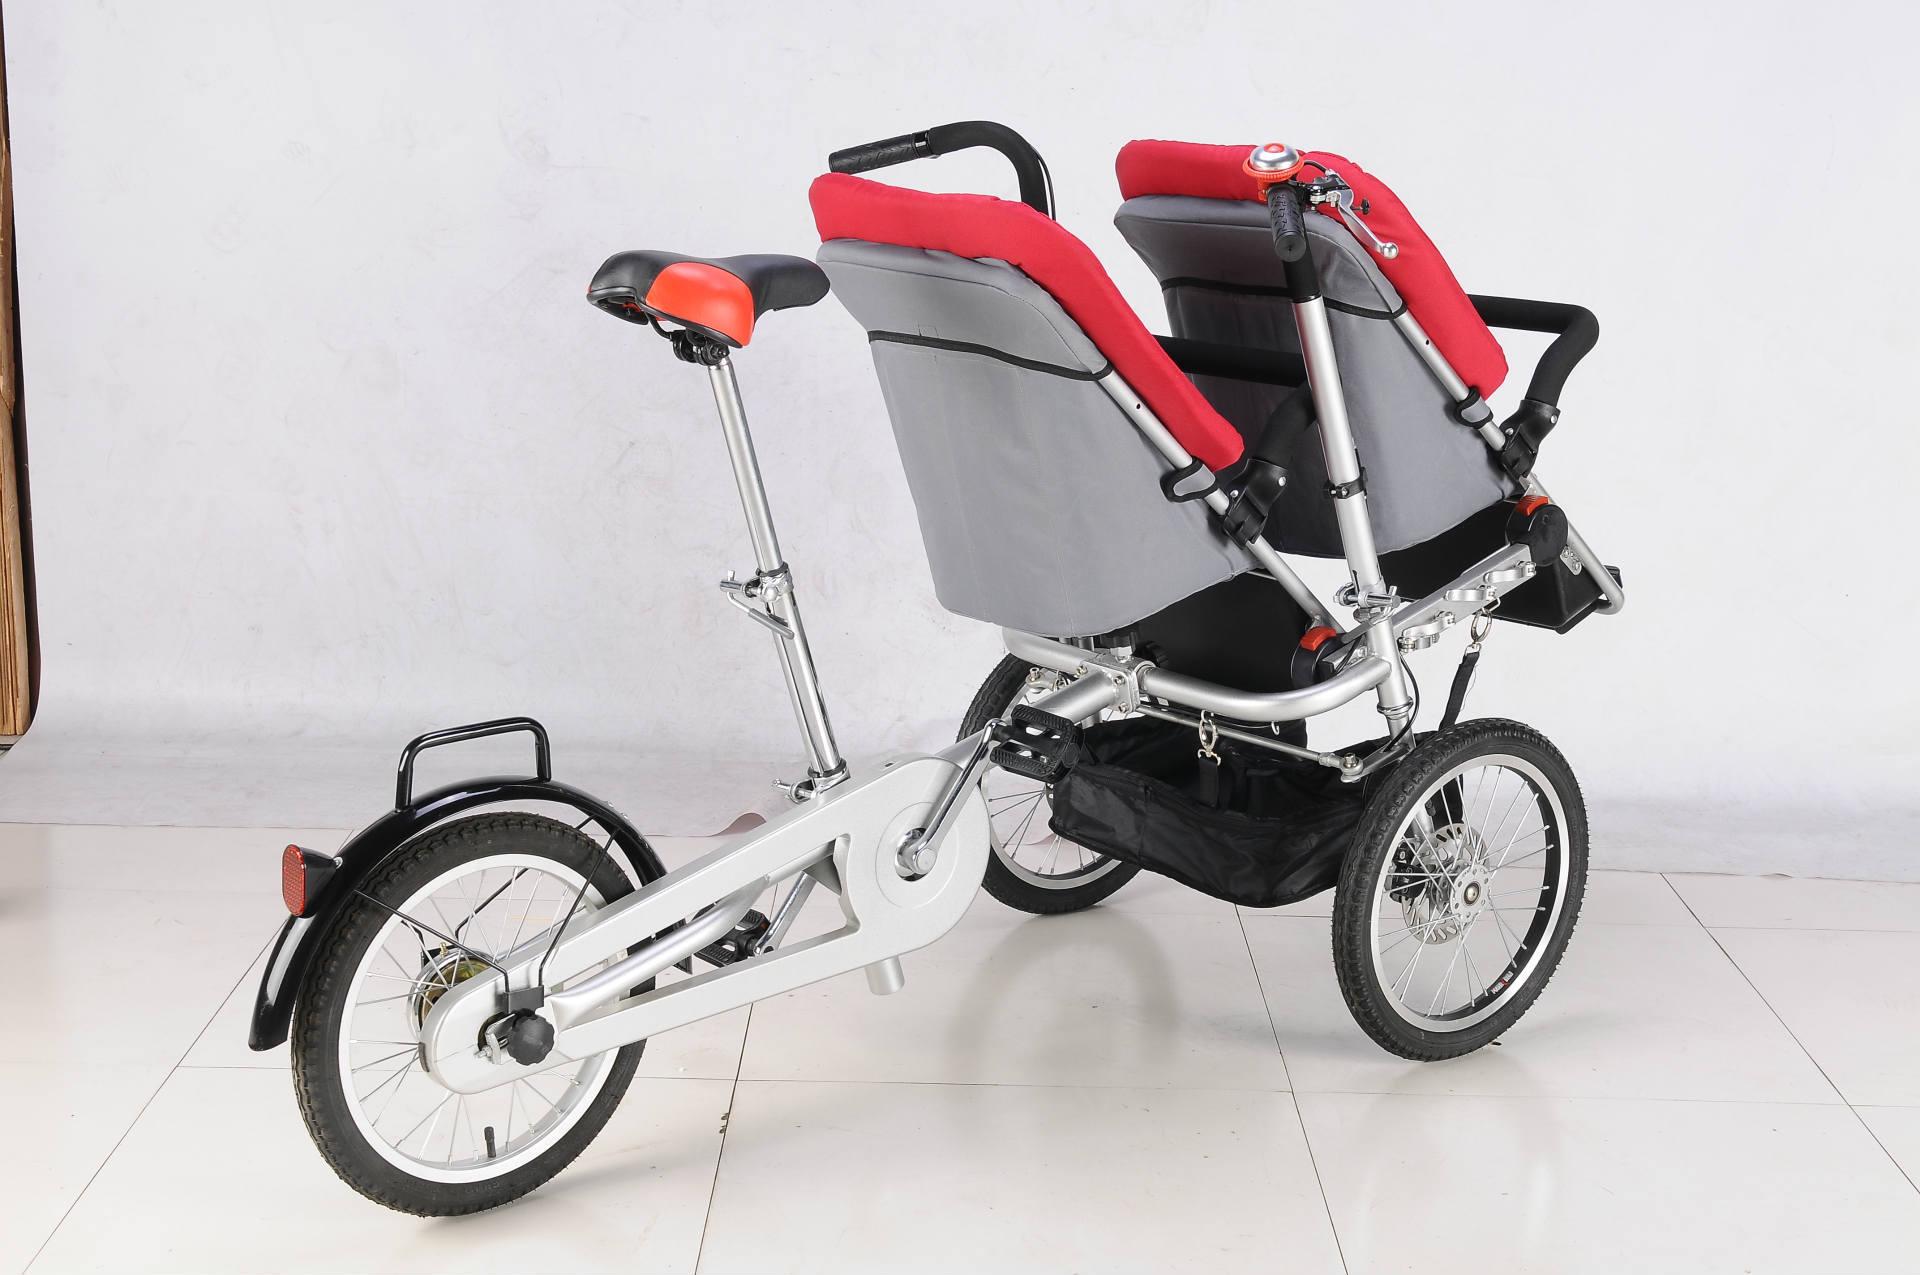 Велосипед для матери и ребенка 新亲子自行车双人折叠自行车手推三轮儿童座椅双胞胎可坐躺母子车